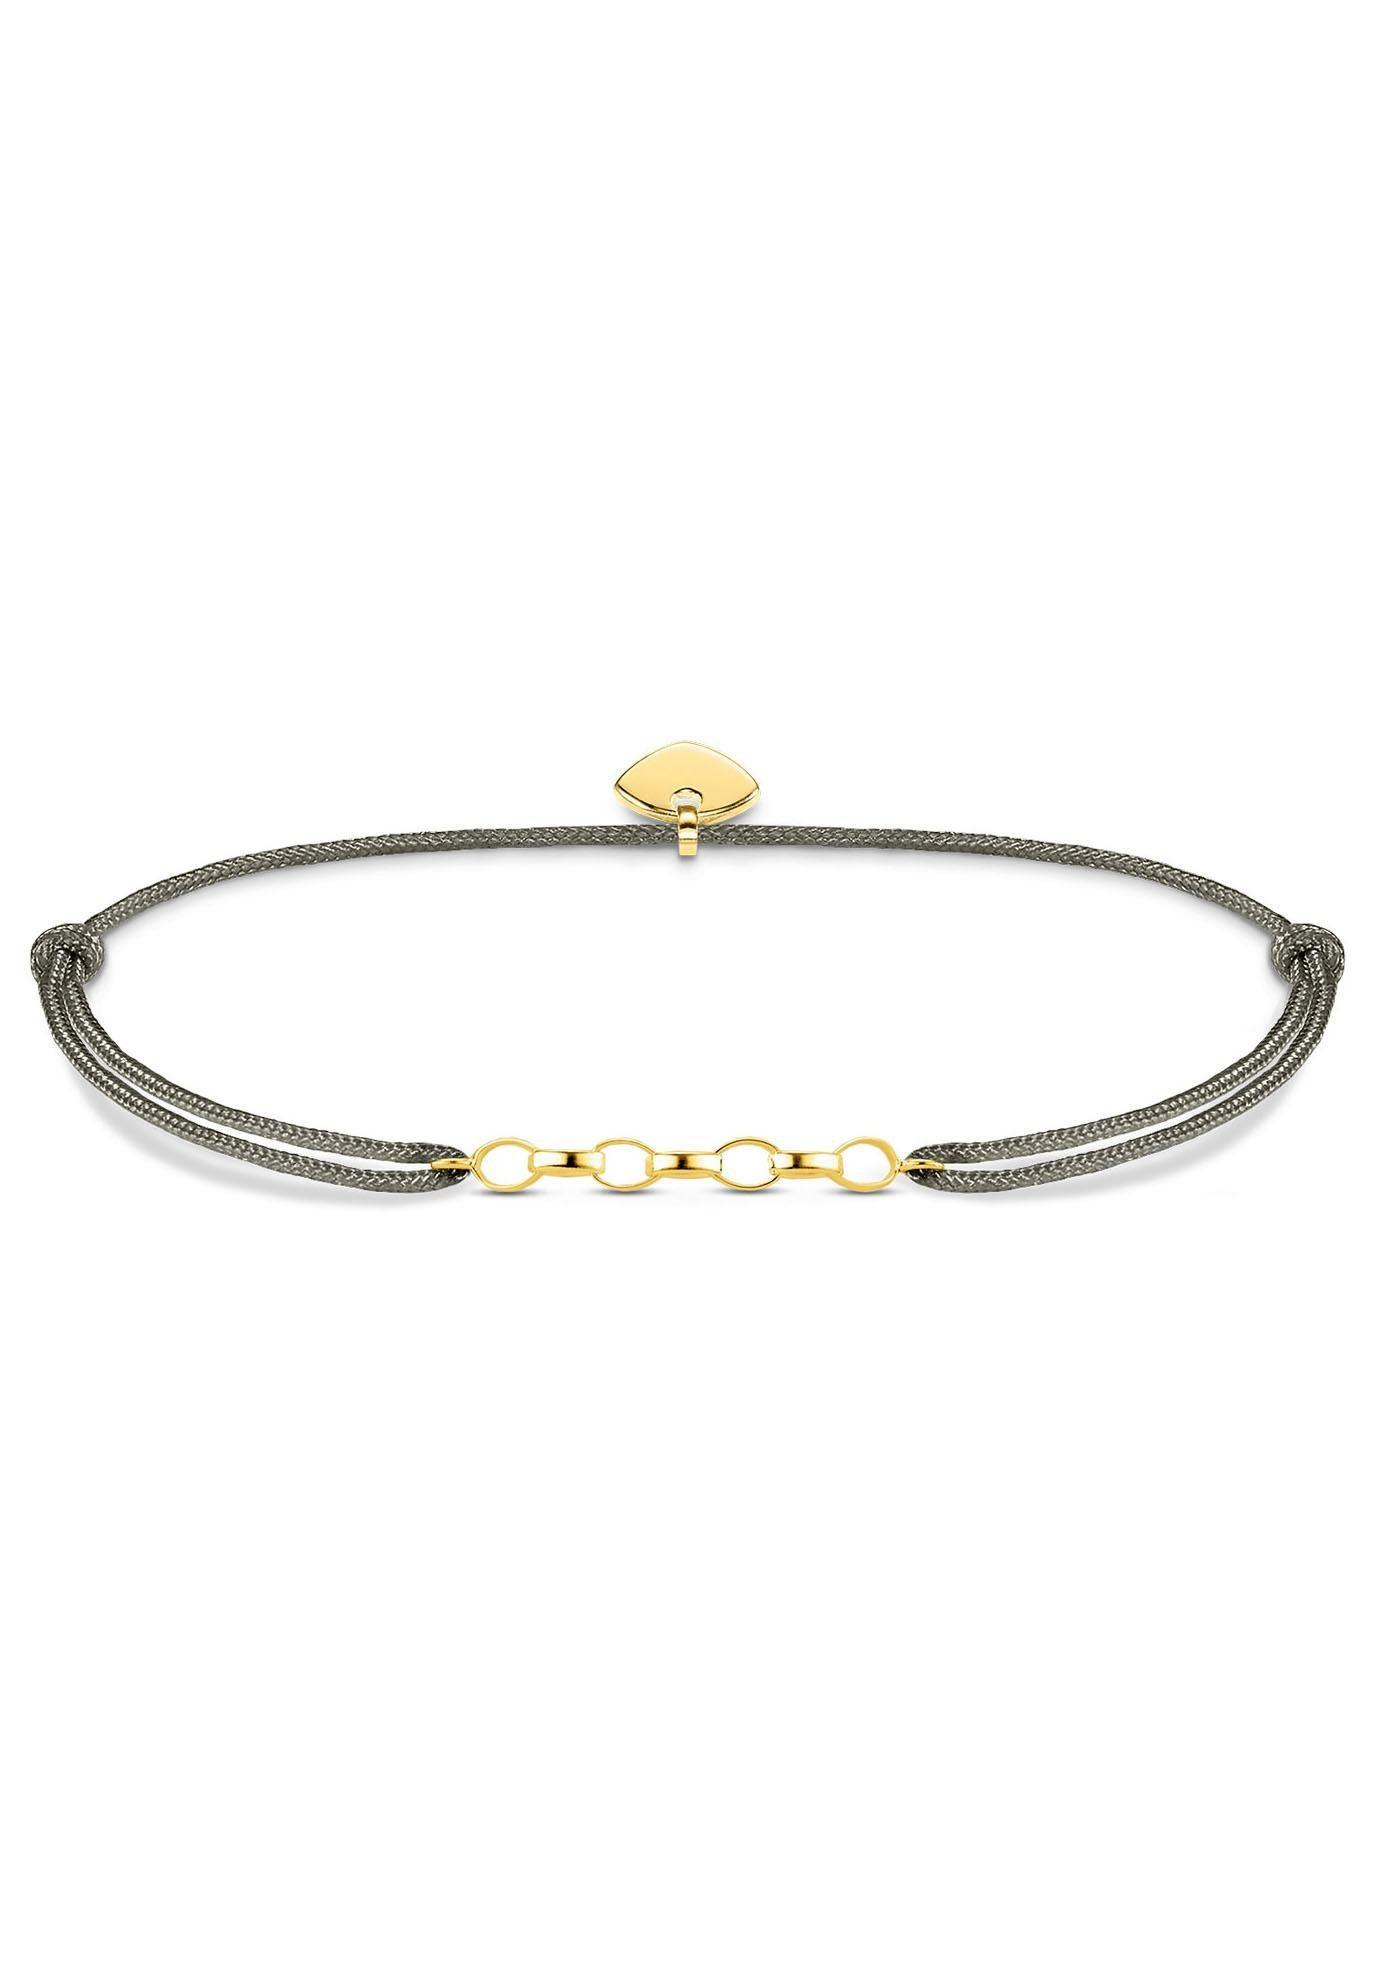 THOMAS SABO Armband »Herz, Little Secret, LS065-848-5-L20v«